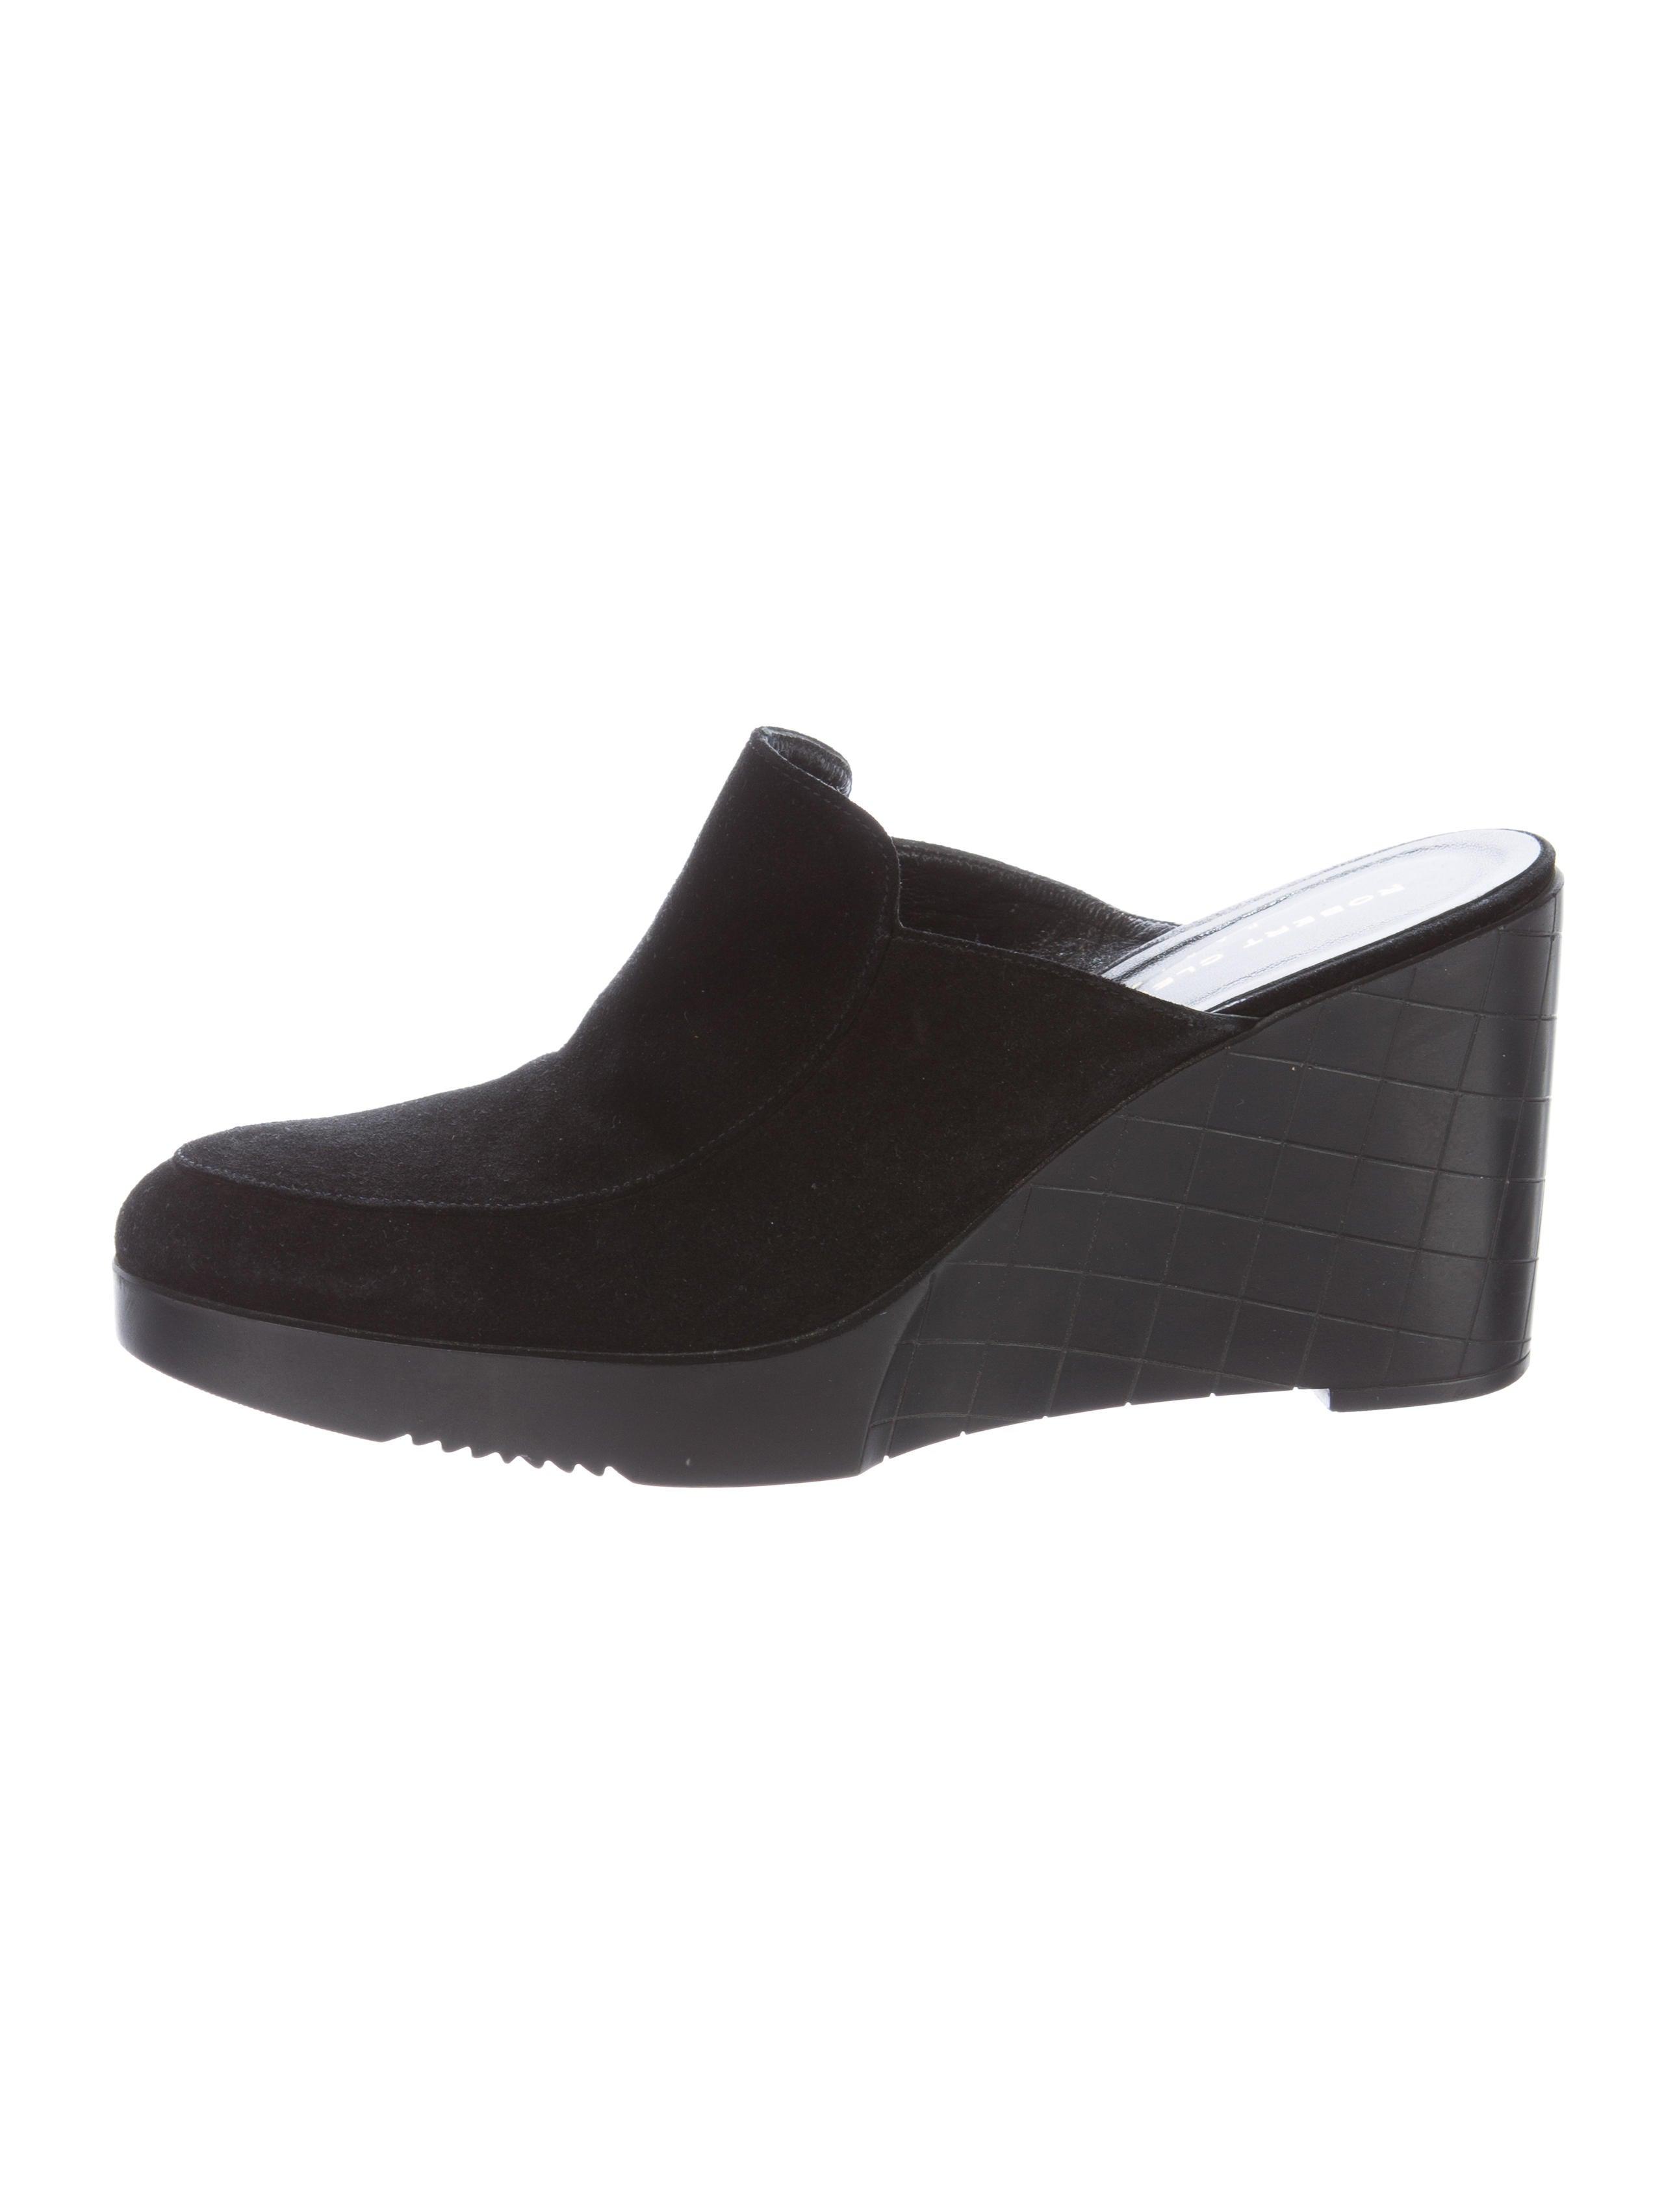 robert clergerie platform suede mules shoes rog25203